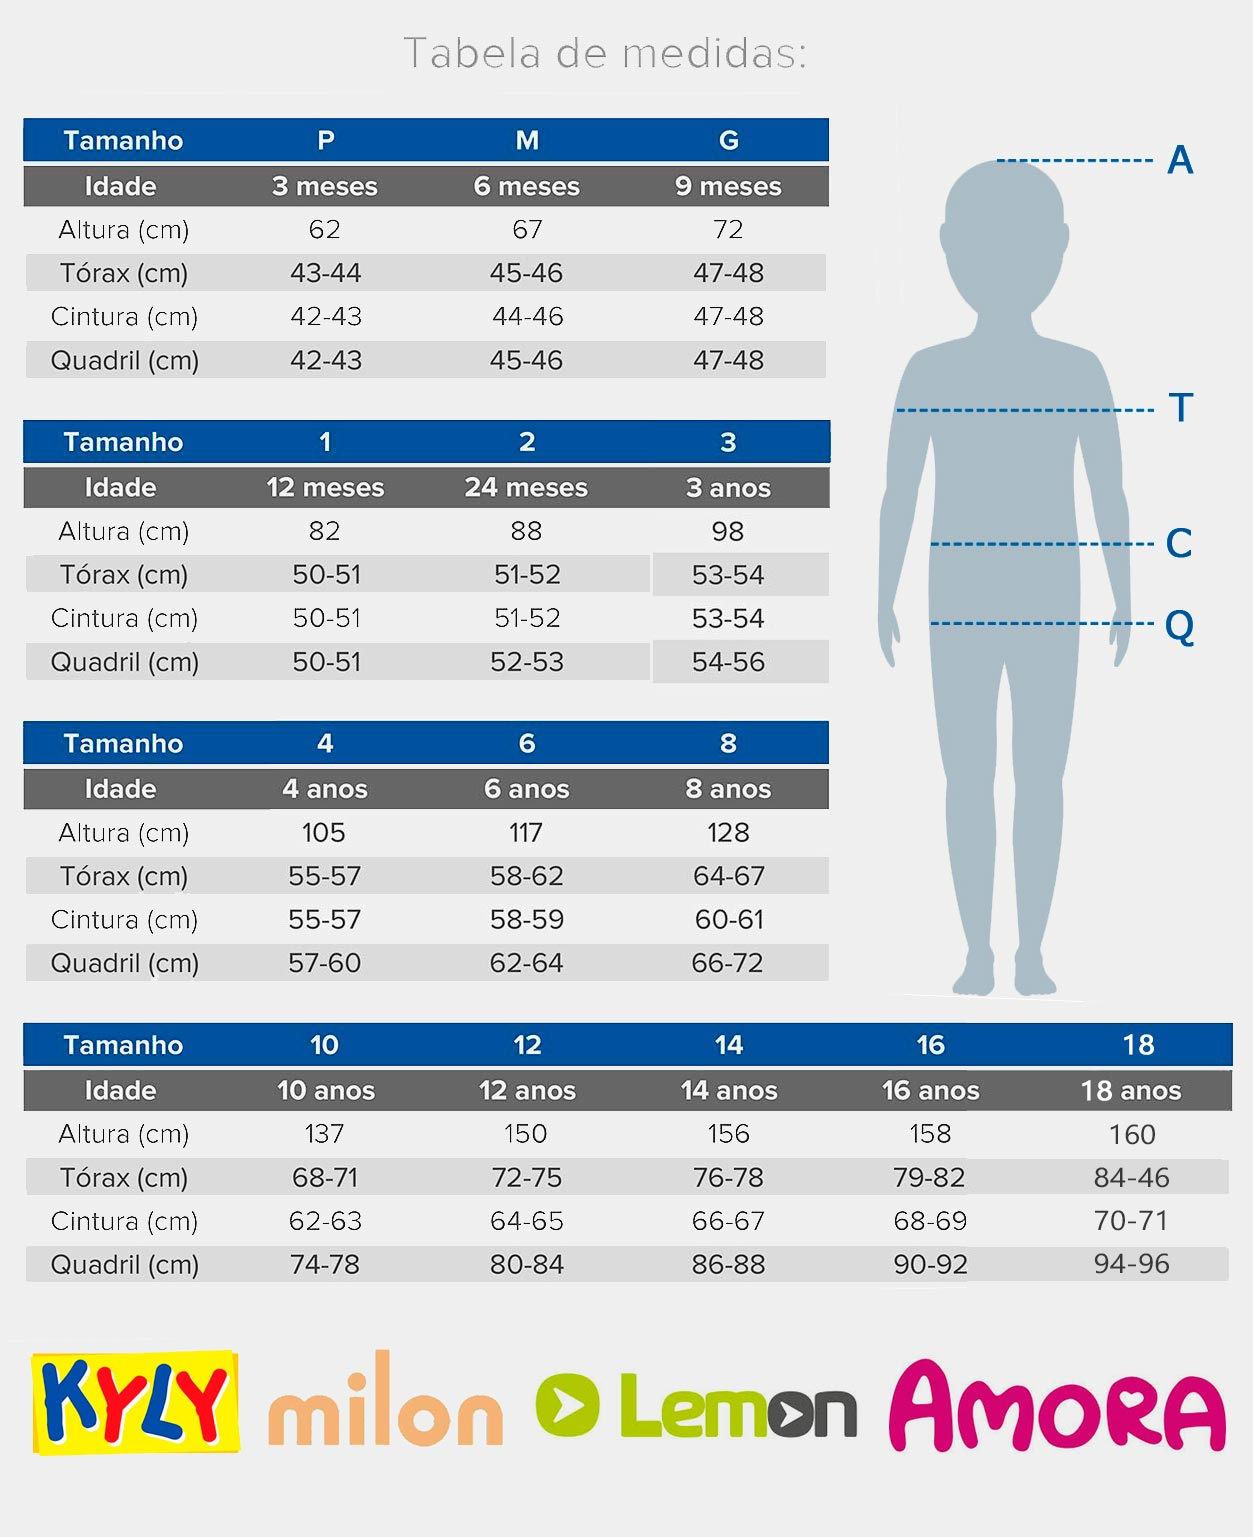 Conjunto Infantil Feminino Curto Preto Style - Kyly: Tabela de medidas